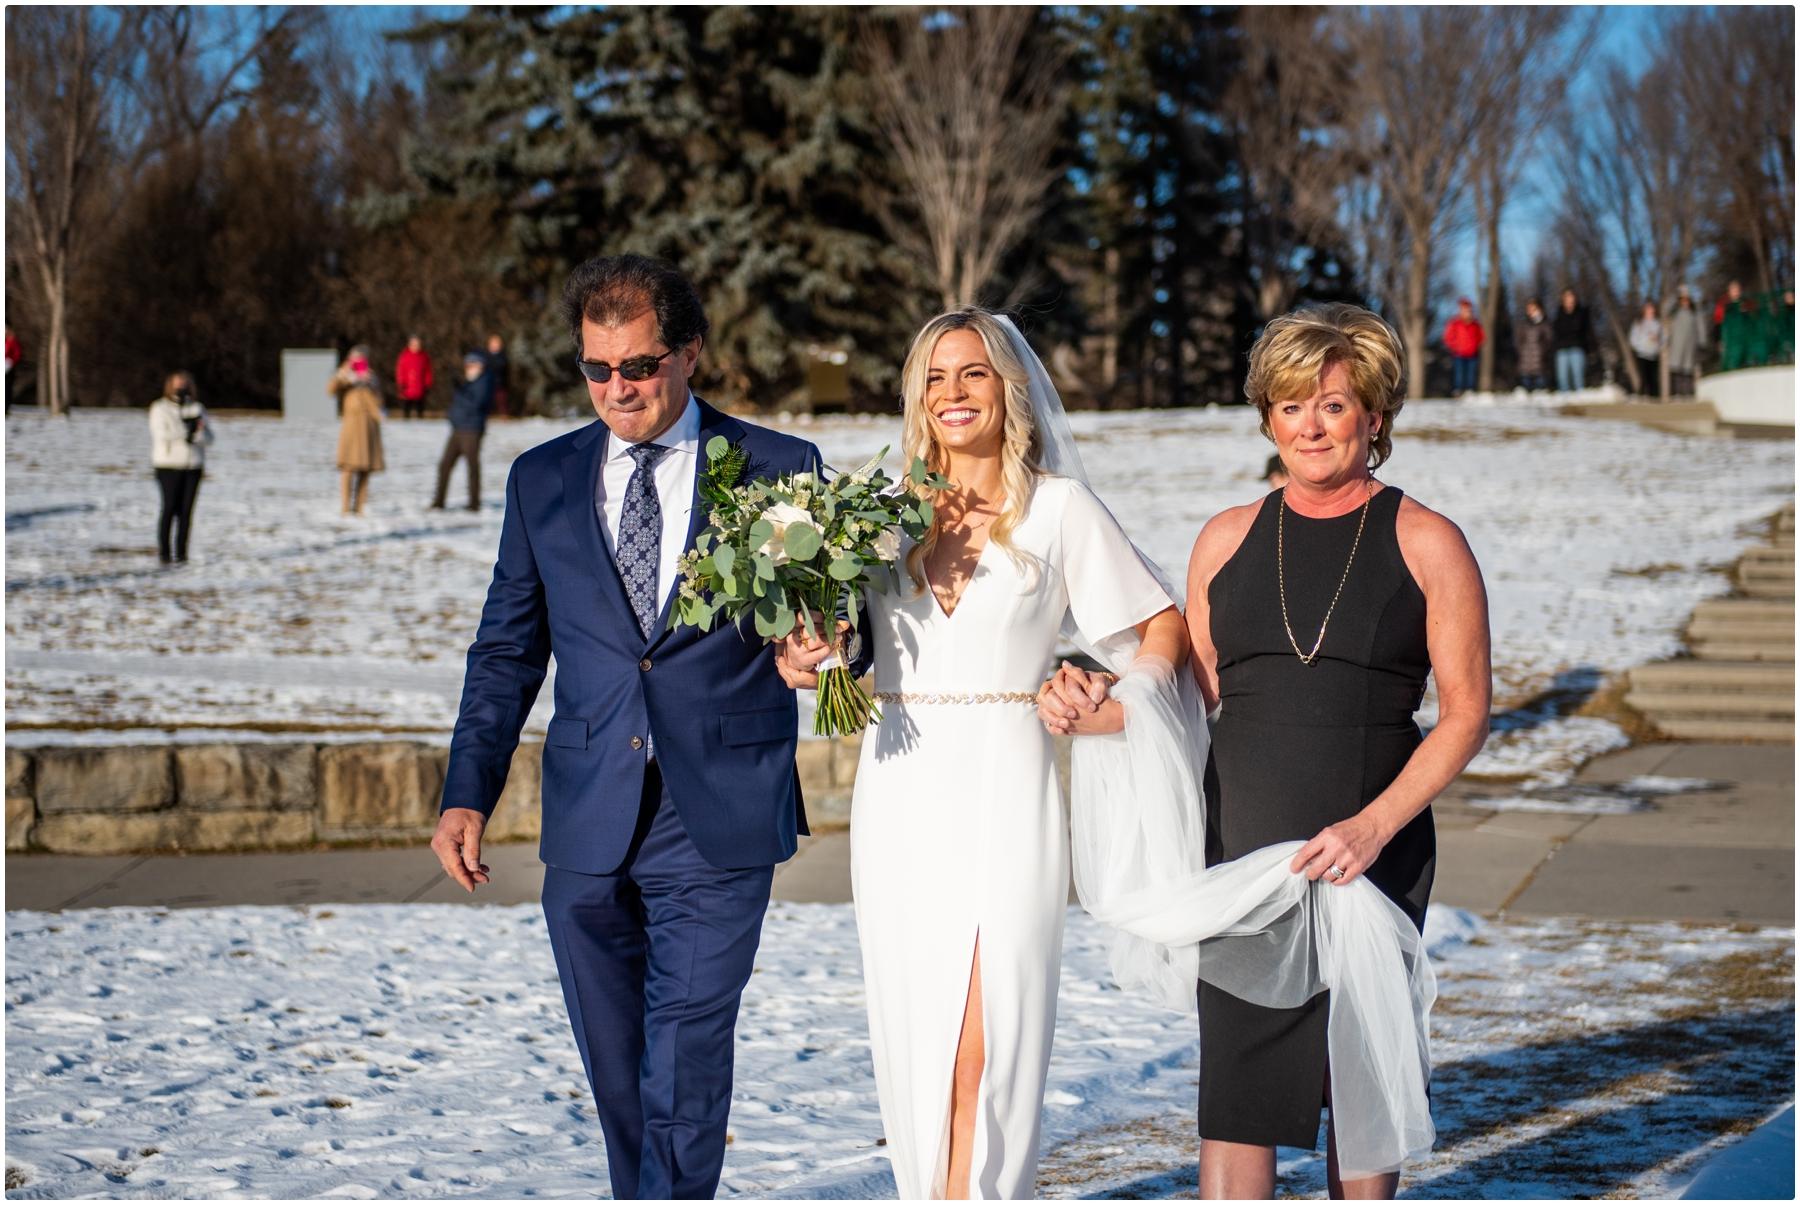 Calgary Outdoor Winter Wedding Ceremony - Baker Park